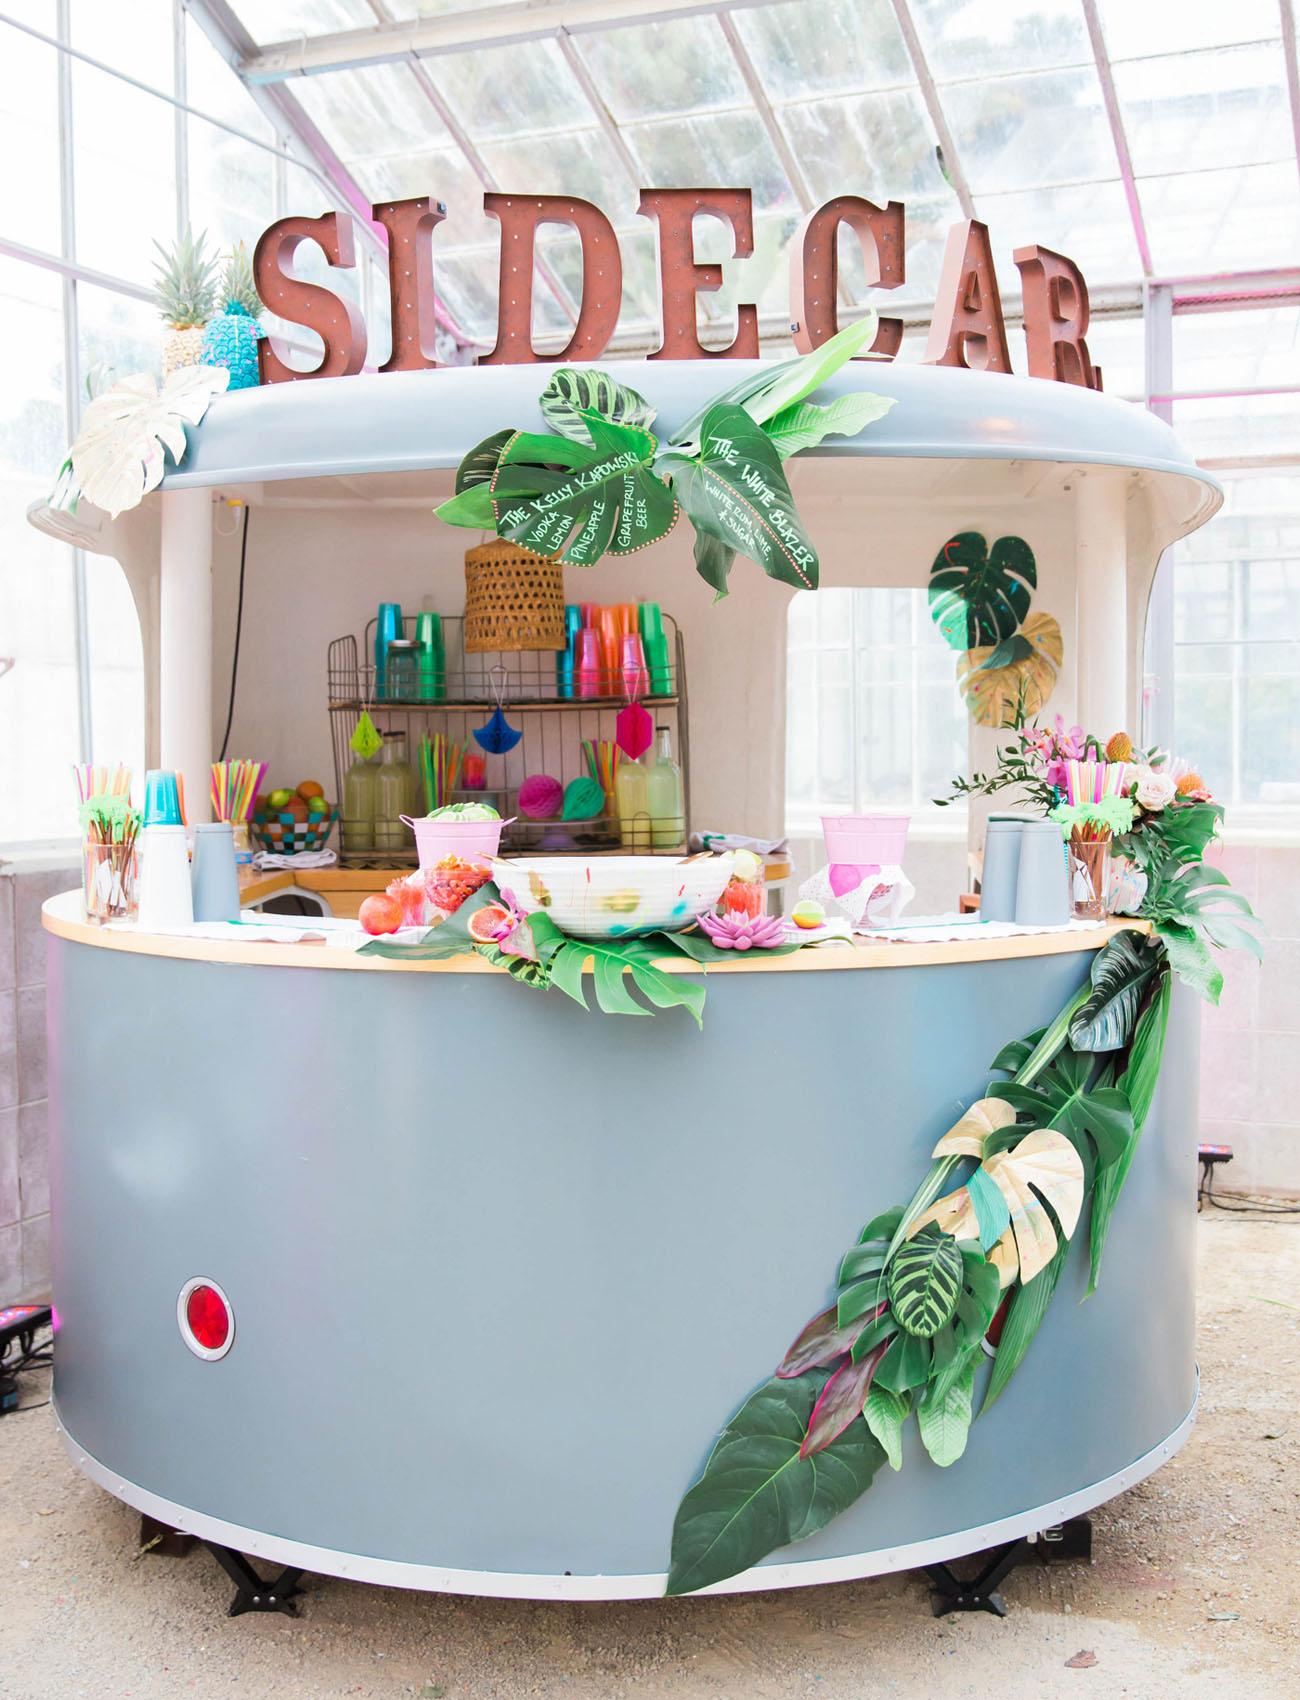 side car tropical bar